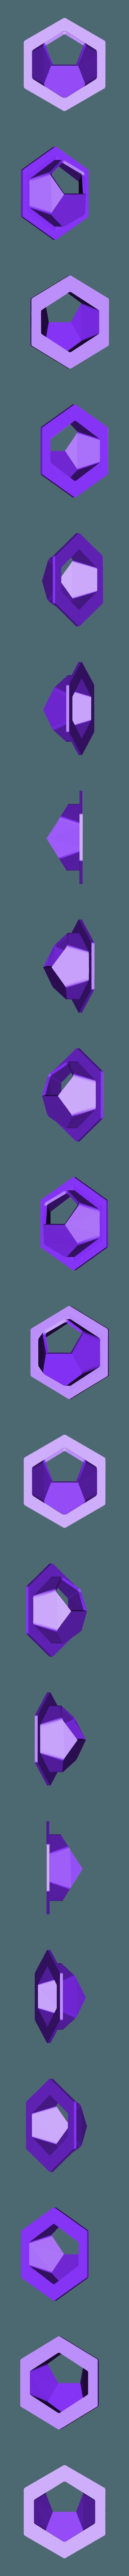 GRIDE_EXA.stl Download free STL file Wall Plantations • 3D printing object, JosephKerr